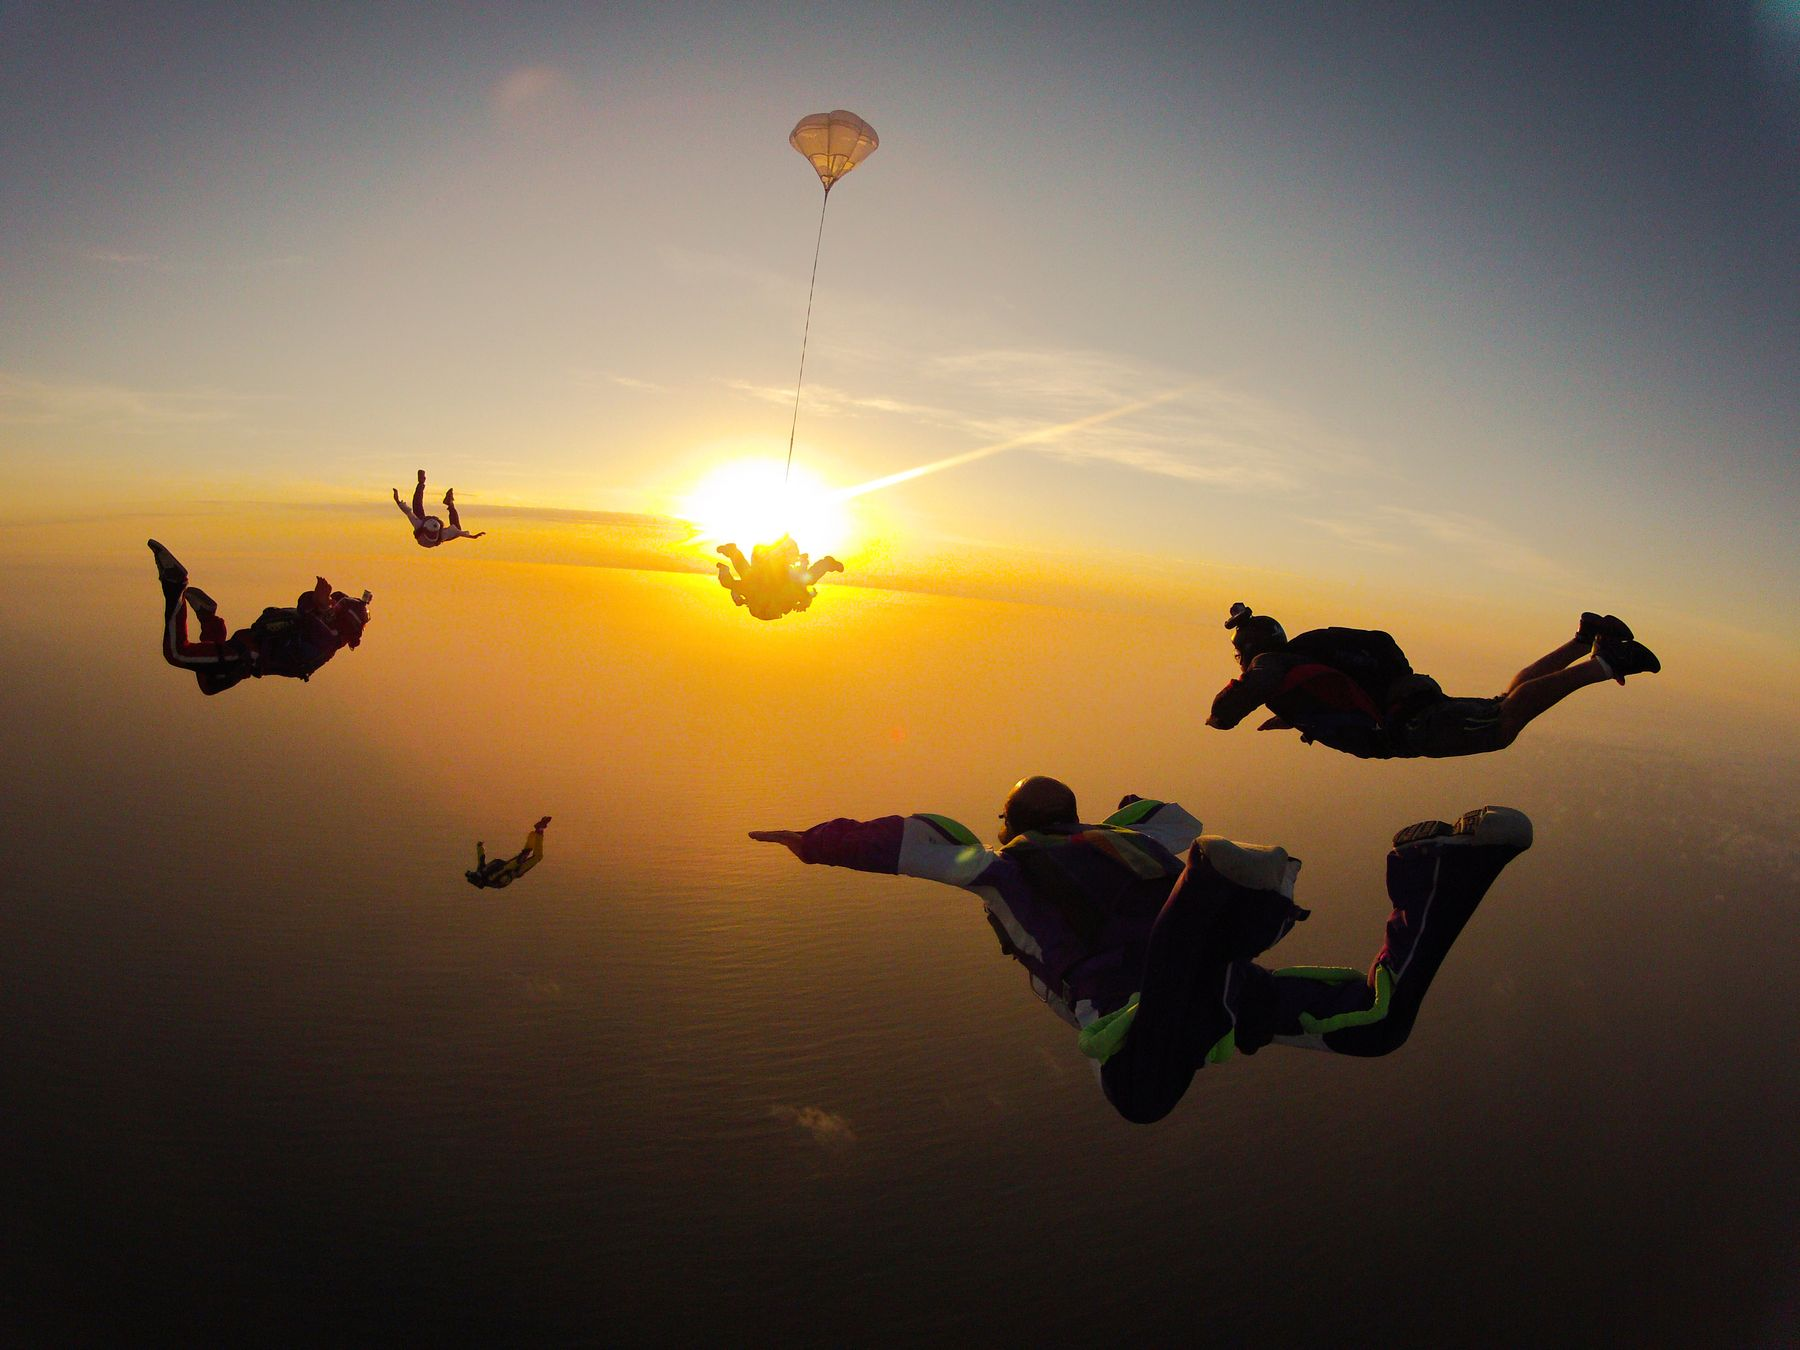 Erlebnisreisen in Neuseeland: Skydiving